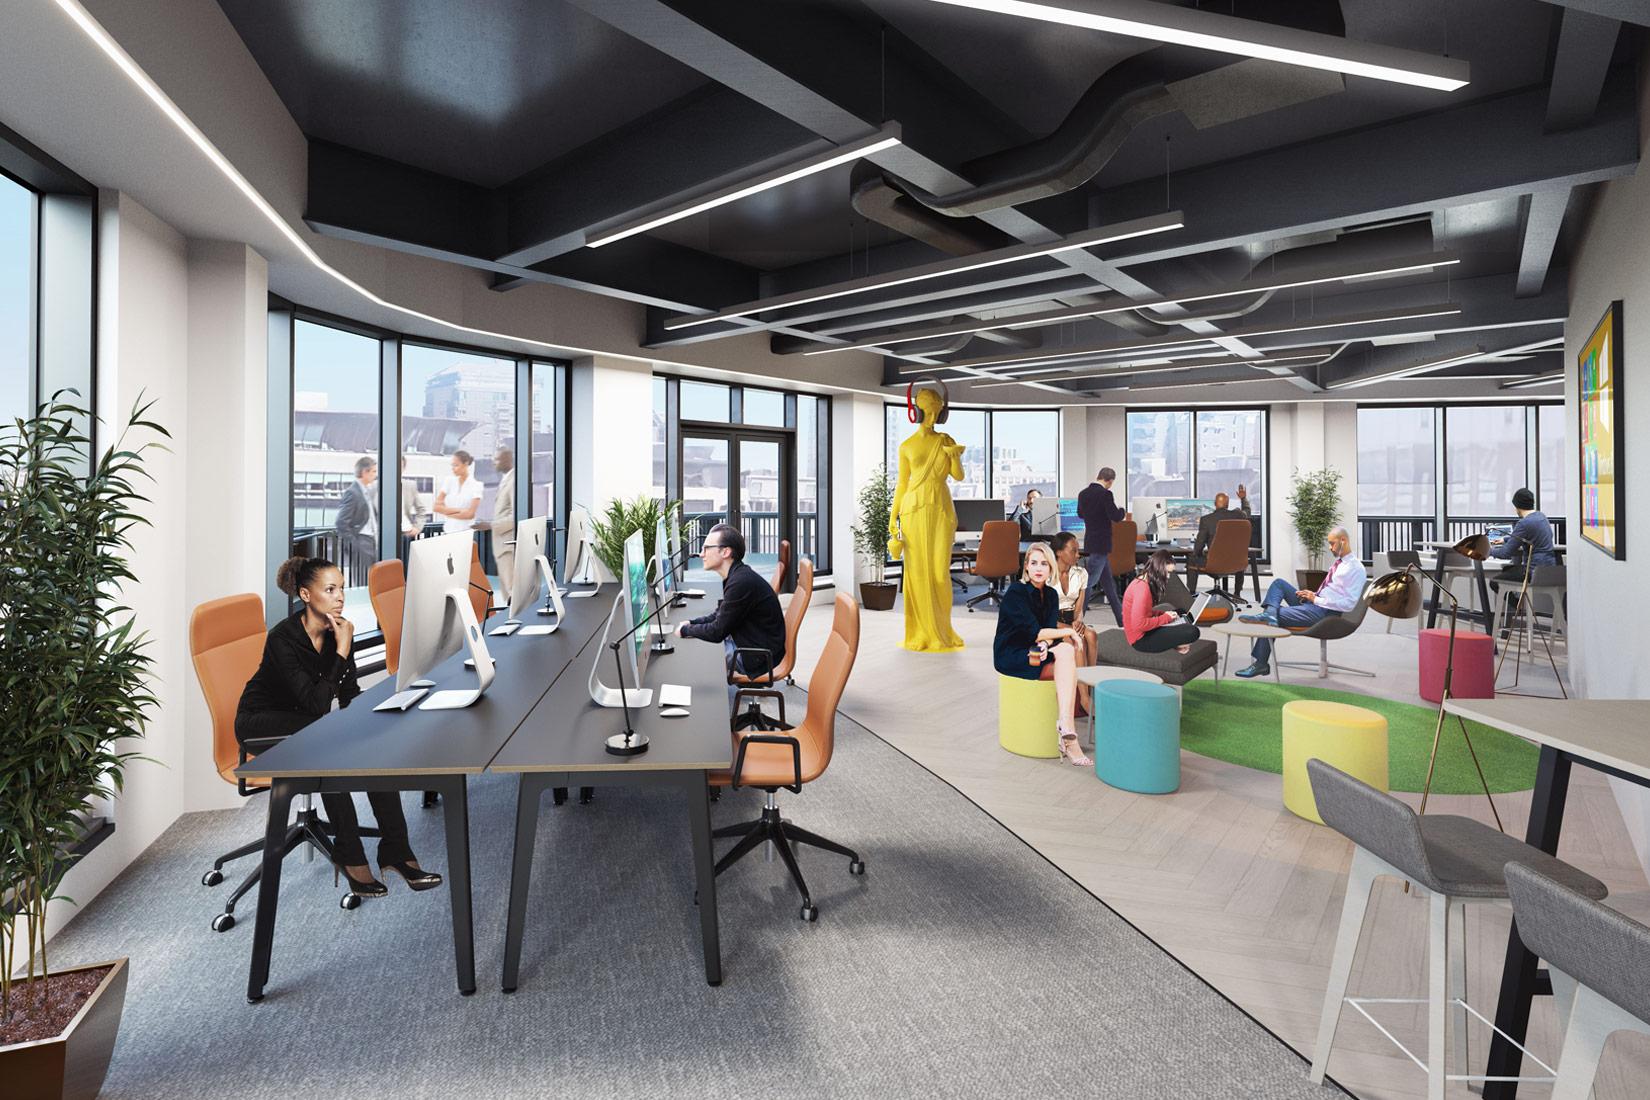 12 King Street, Leeds, 3D visual of office space